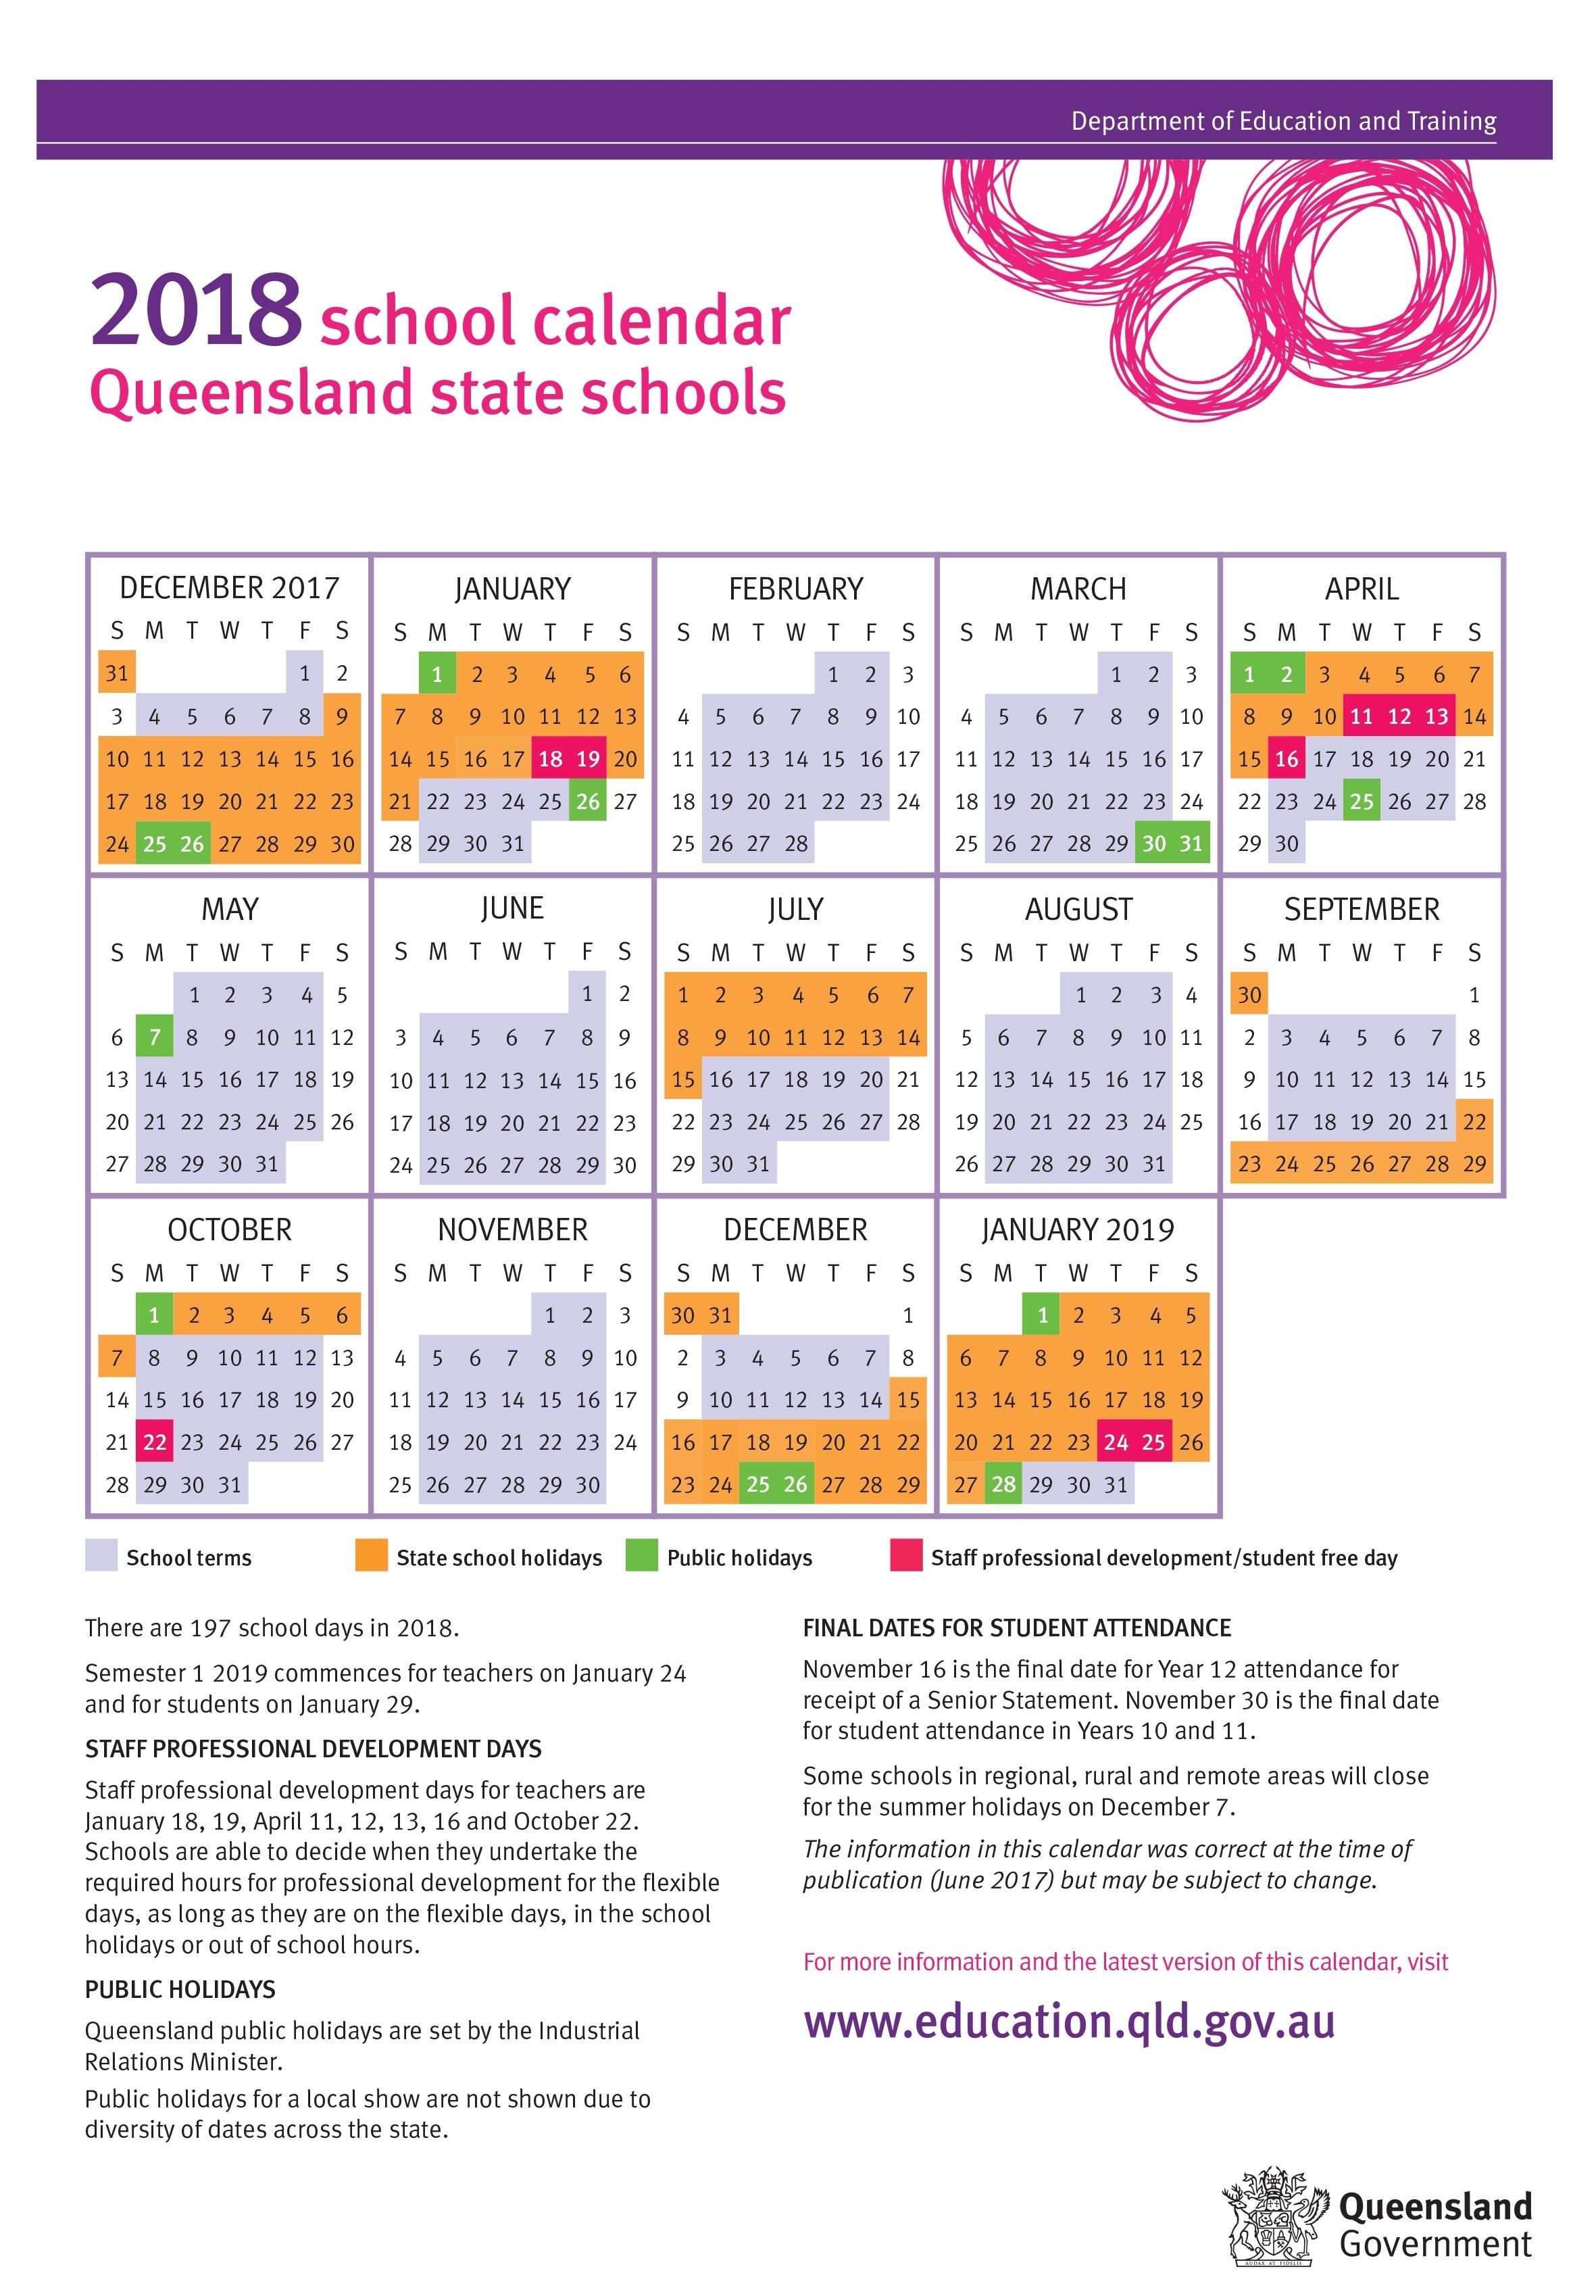 Free Yearly Calendar 2019 Singapore. School Holidays 2019 Nz. School